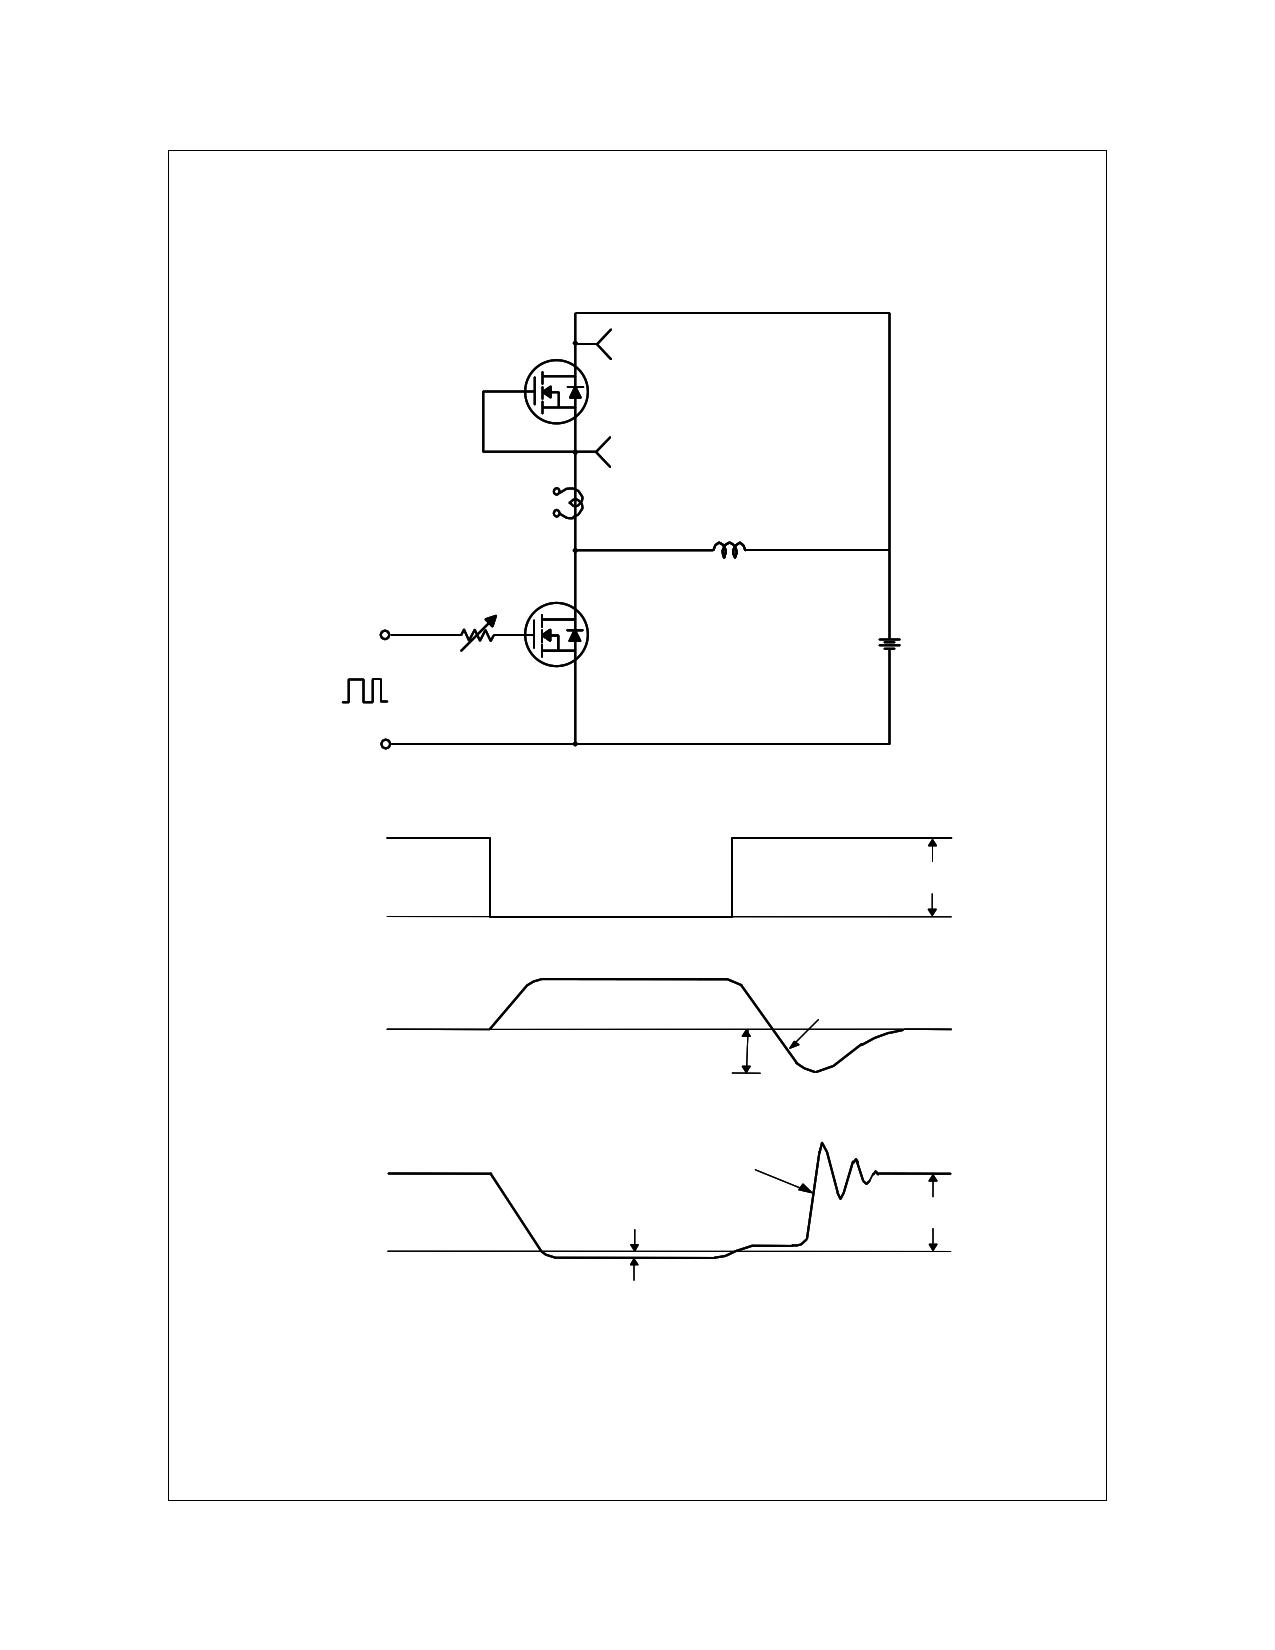 FQA44N08 電子部品, 半導体